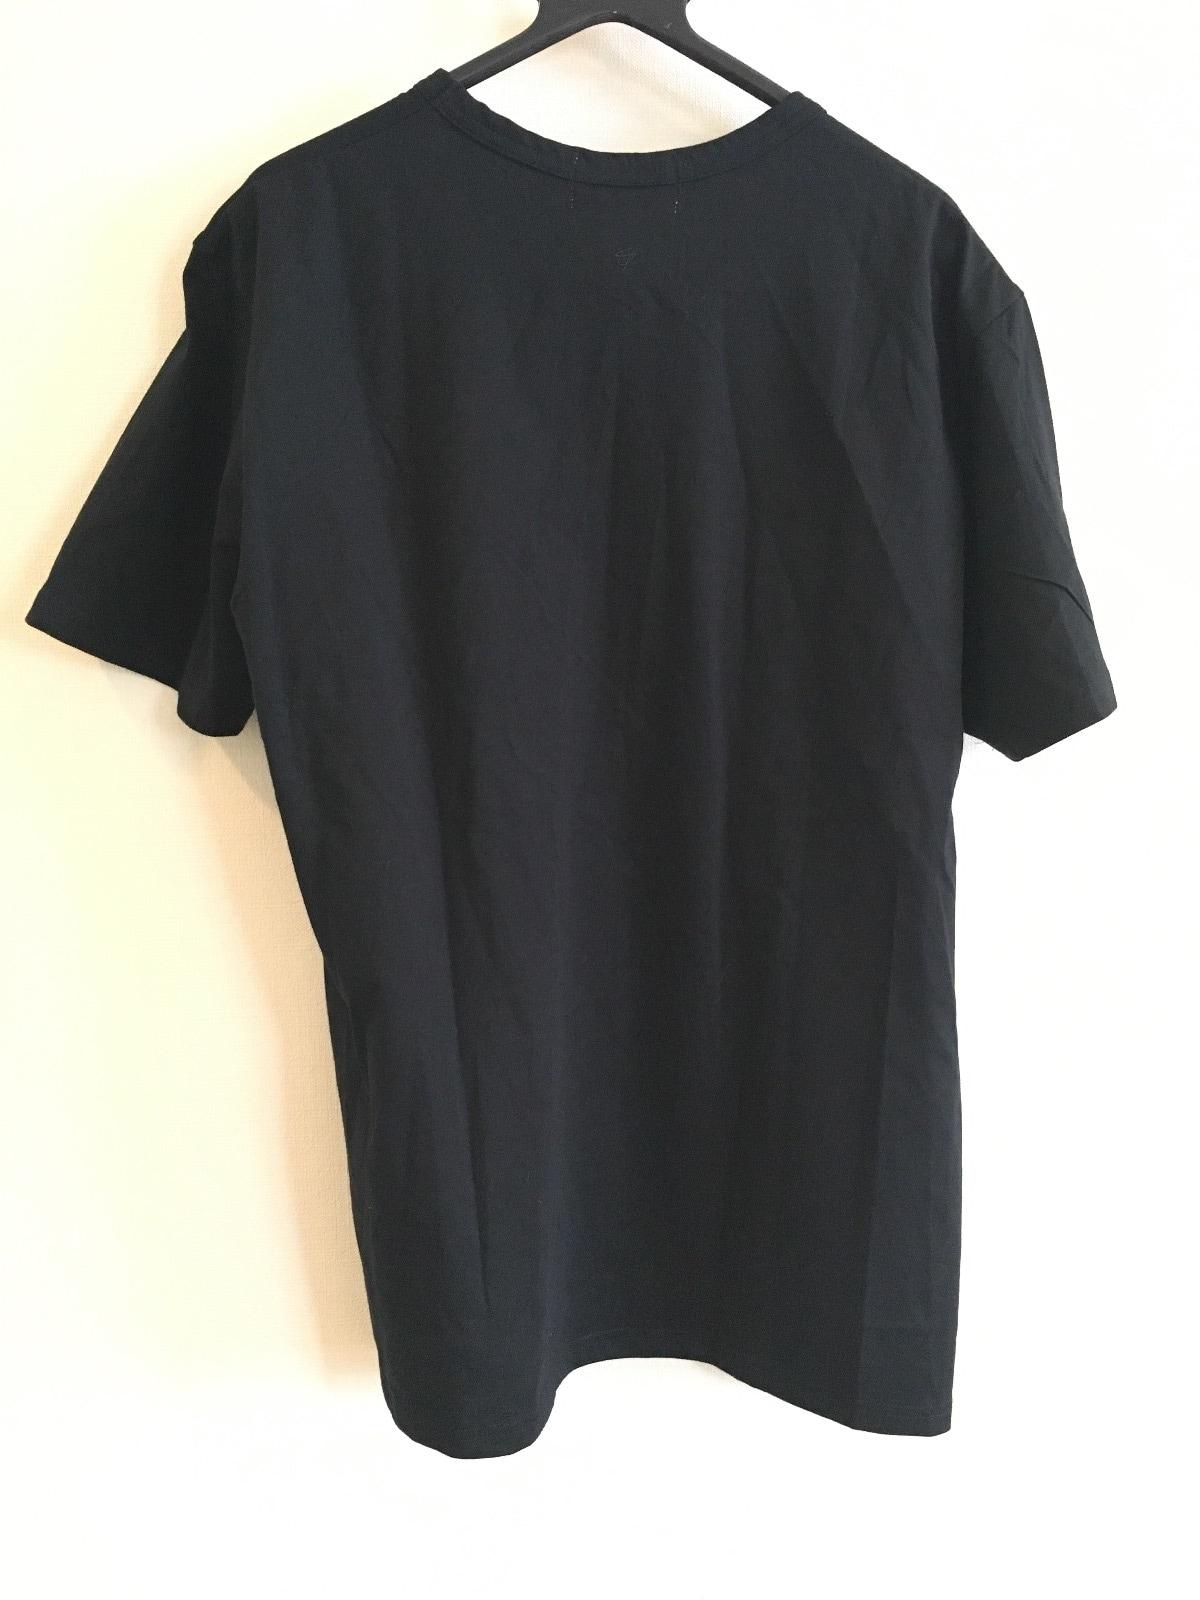 ALOYE(アロイ)のTシャツ